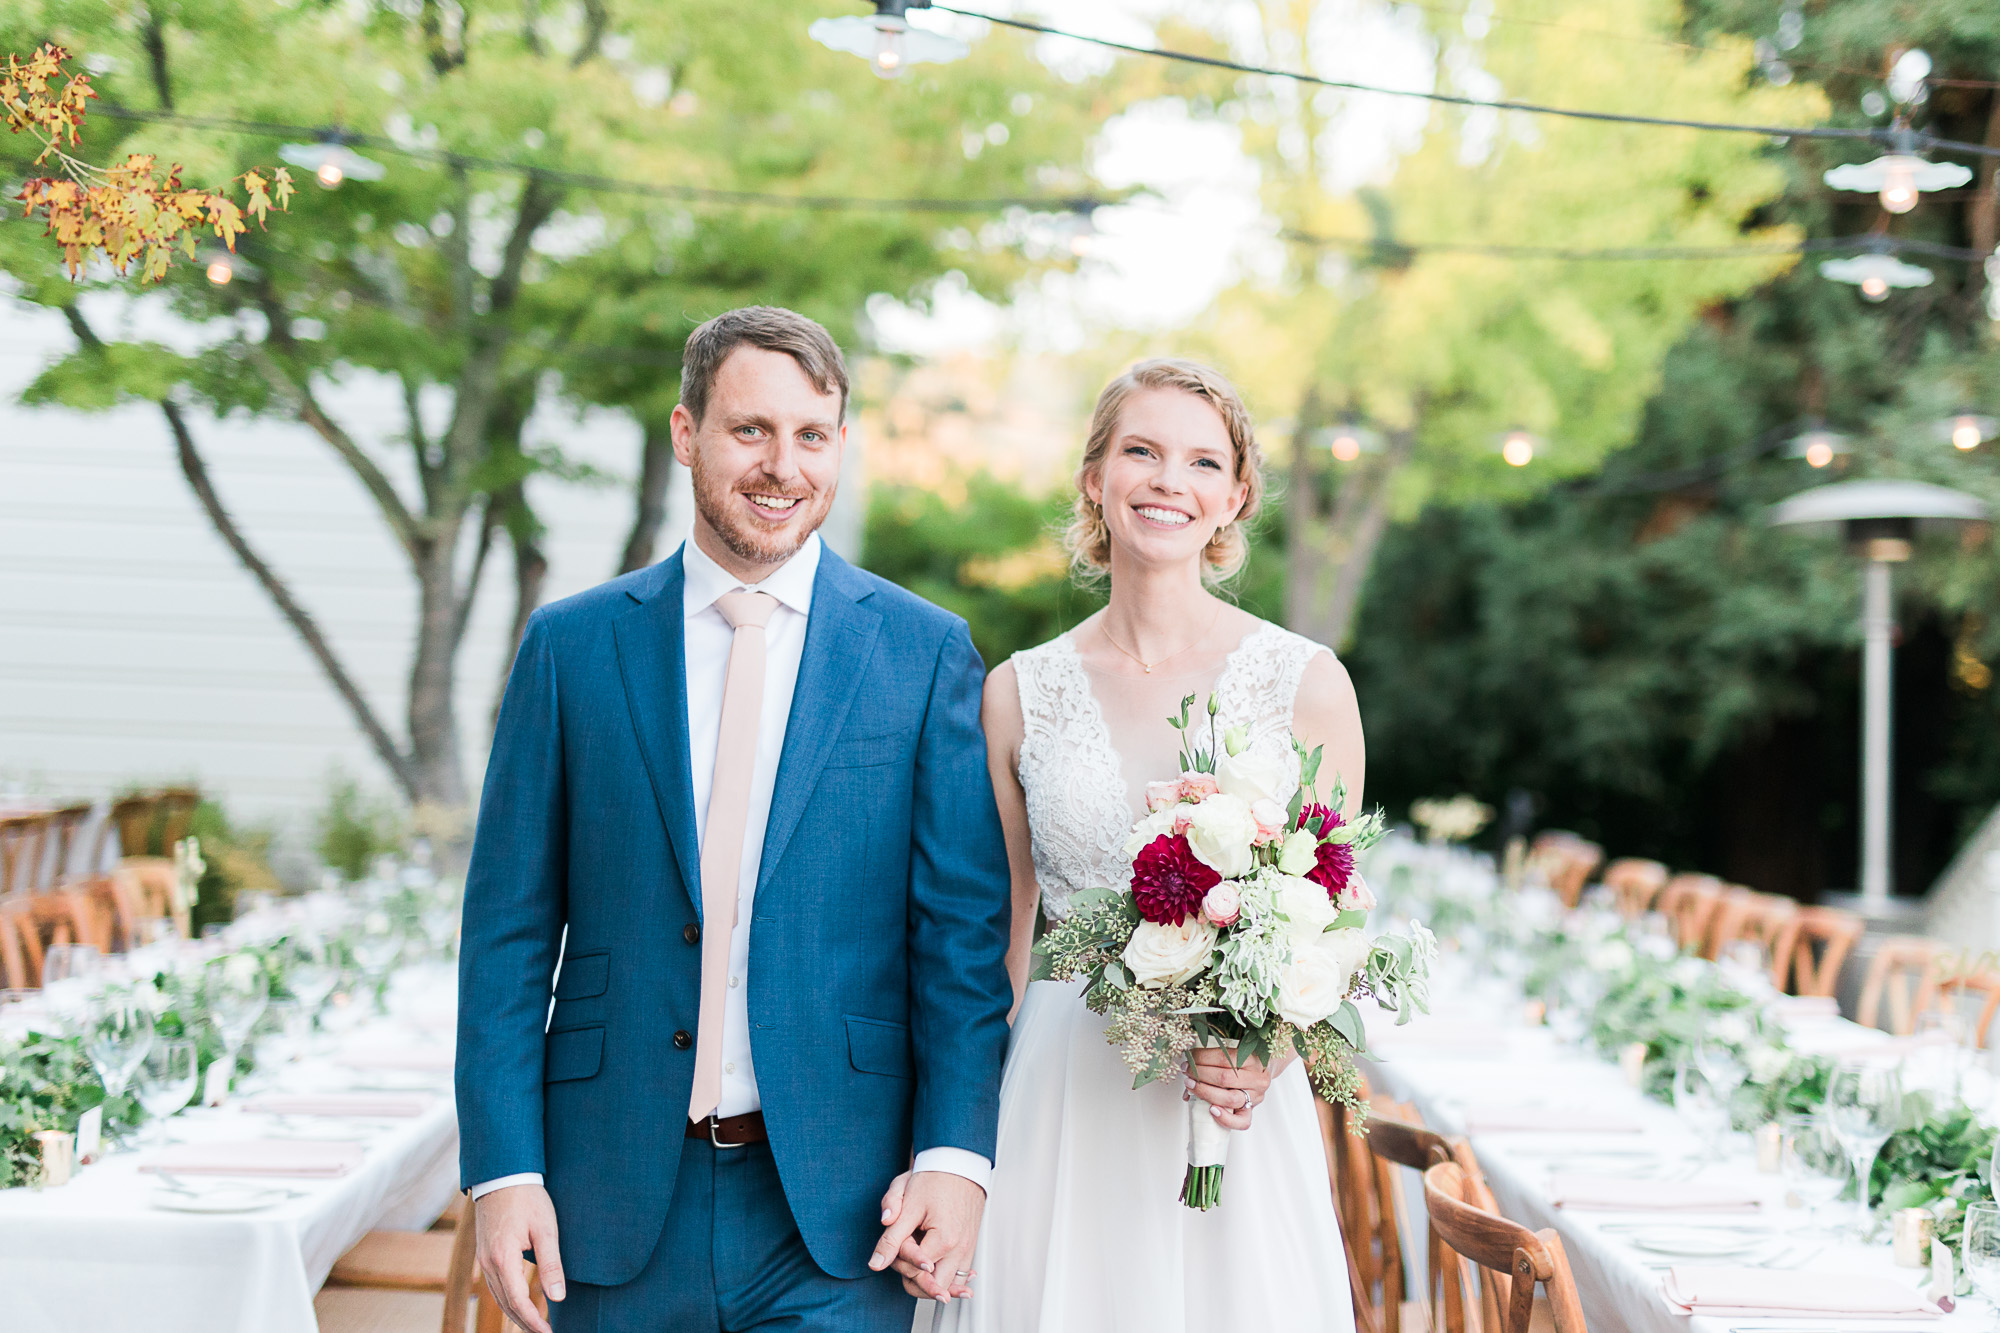 Generals+Daughter+Wedding+Photos+by+JBJ+Pictures+-+Ramekins+Wedding+Venue+Photographer+in+Sonoma+Napa+(34).jpg